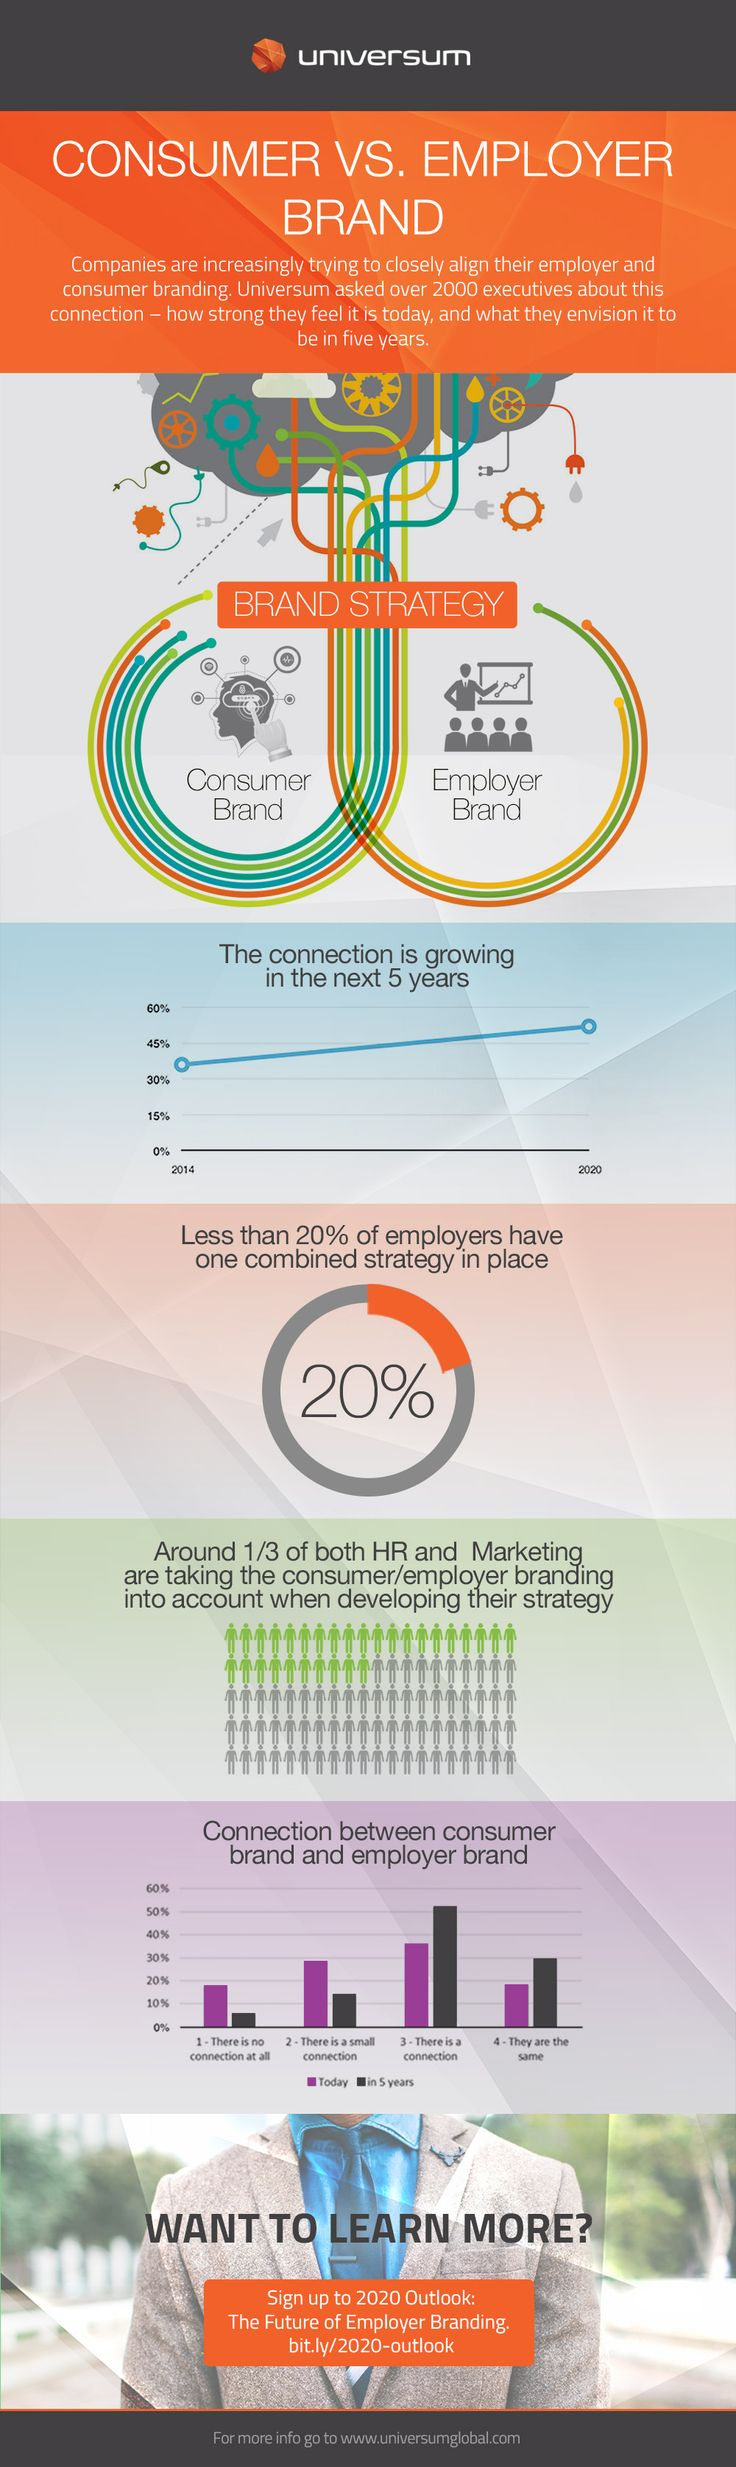 Consumer versus Employer Brand